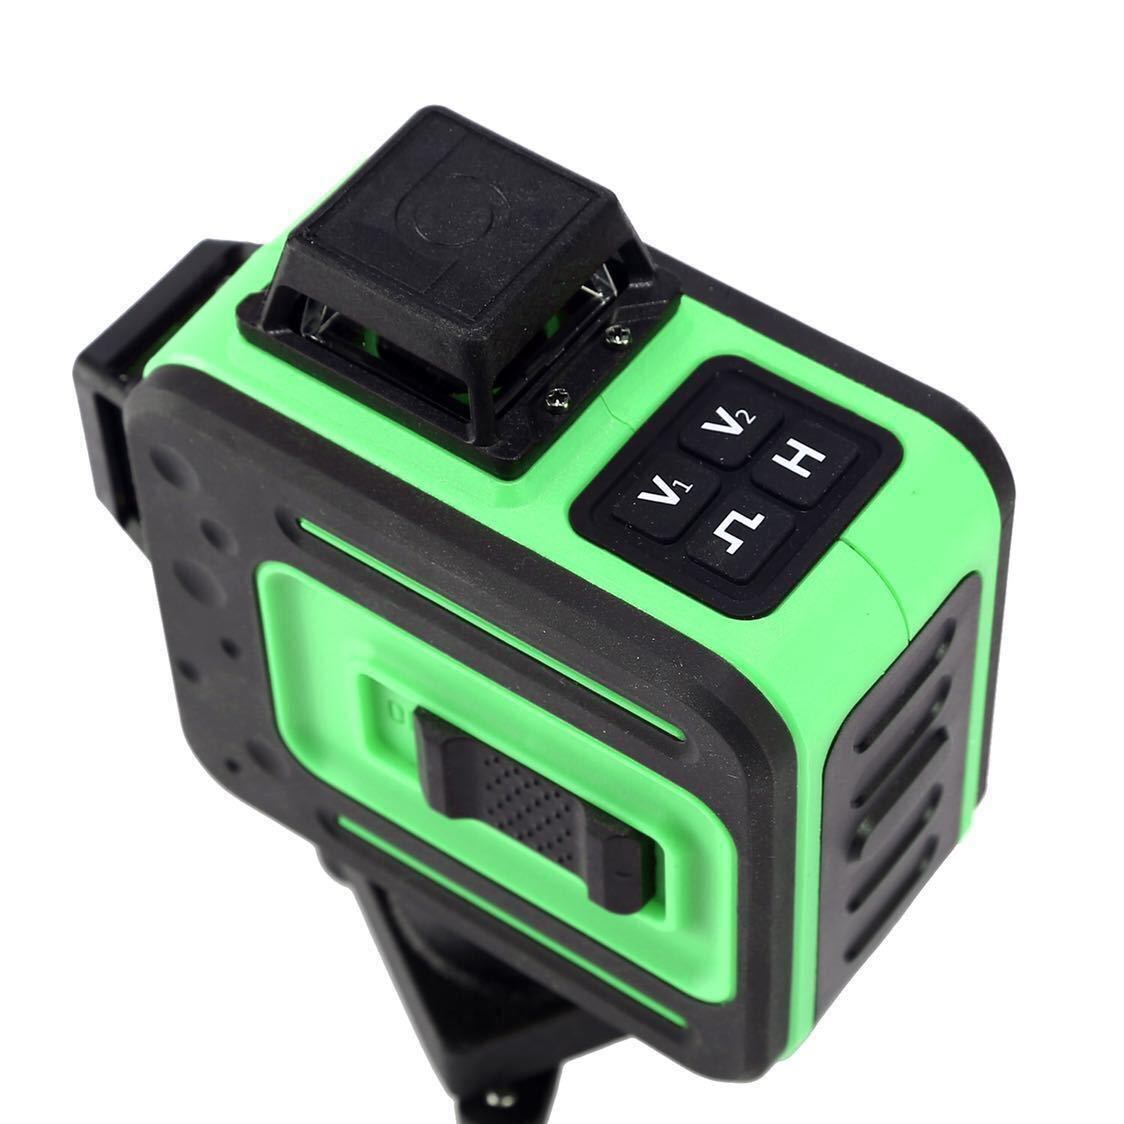 3D LASER 12ライン フルライングリーンレーザー墨出し器 360°垂直*2・360°水平*1グリーンレーザー墨出し器 レーザーレベル 水平器_画像6